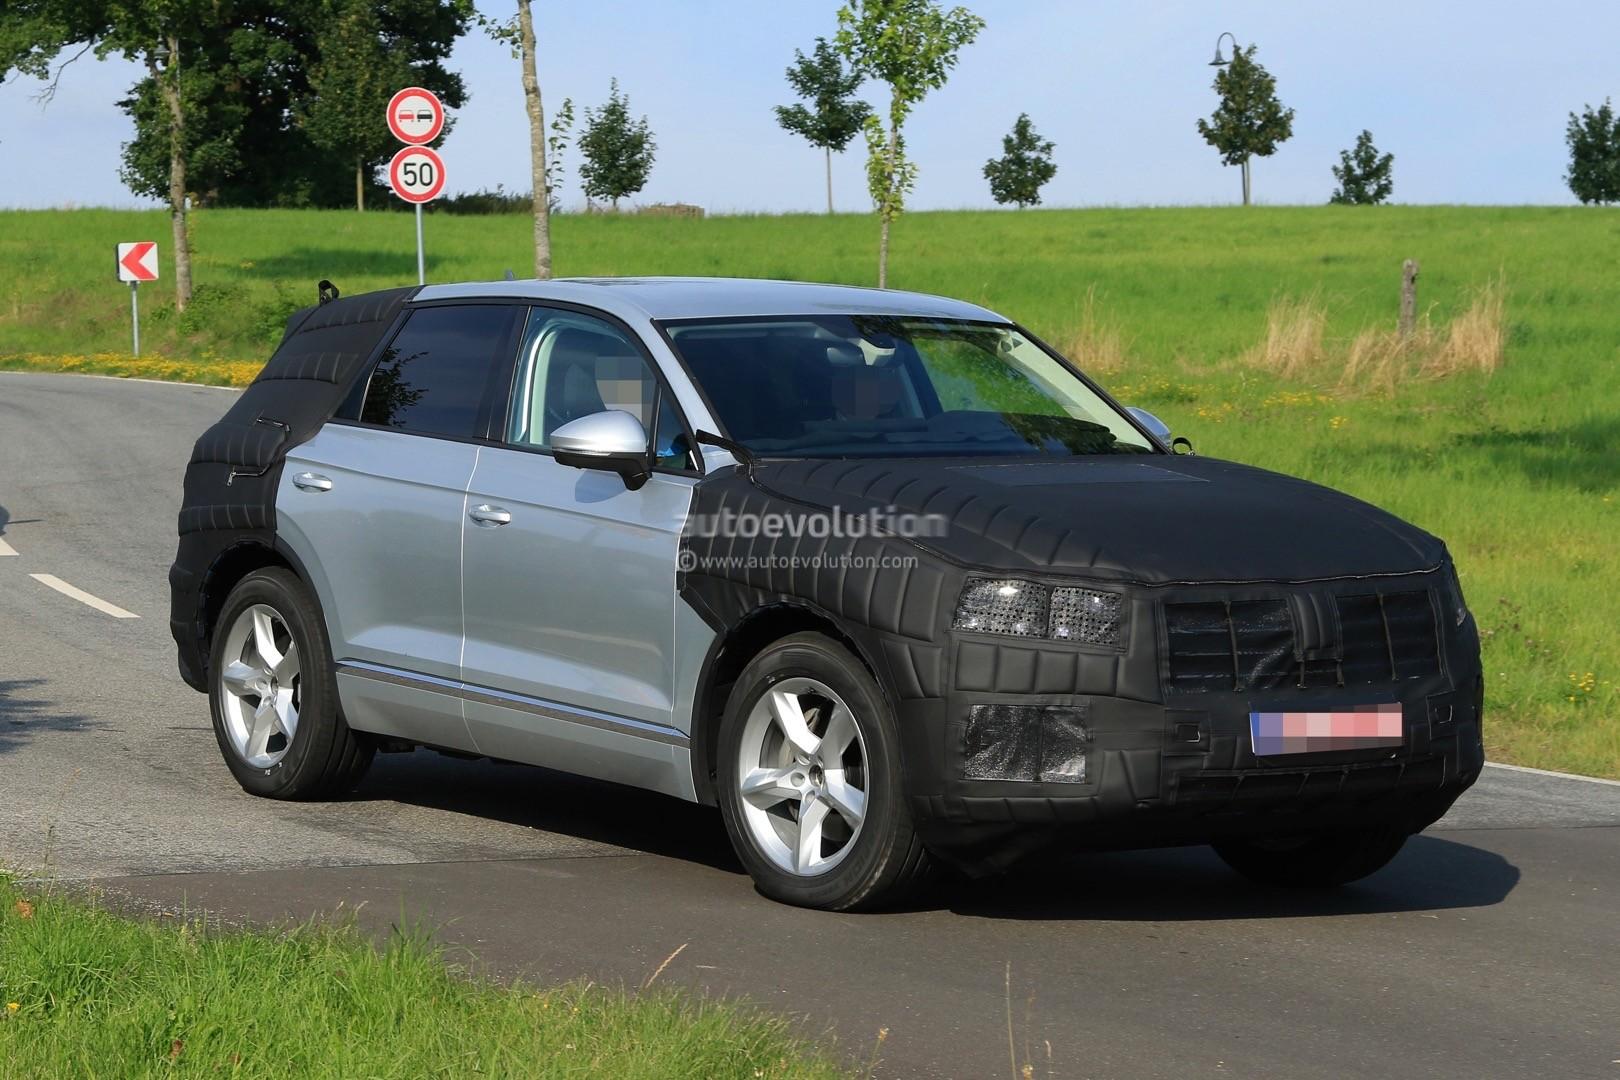 2018 volkswagen touareg spied benchmarking against audi q7